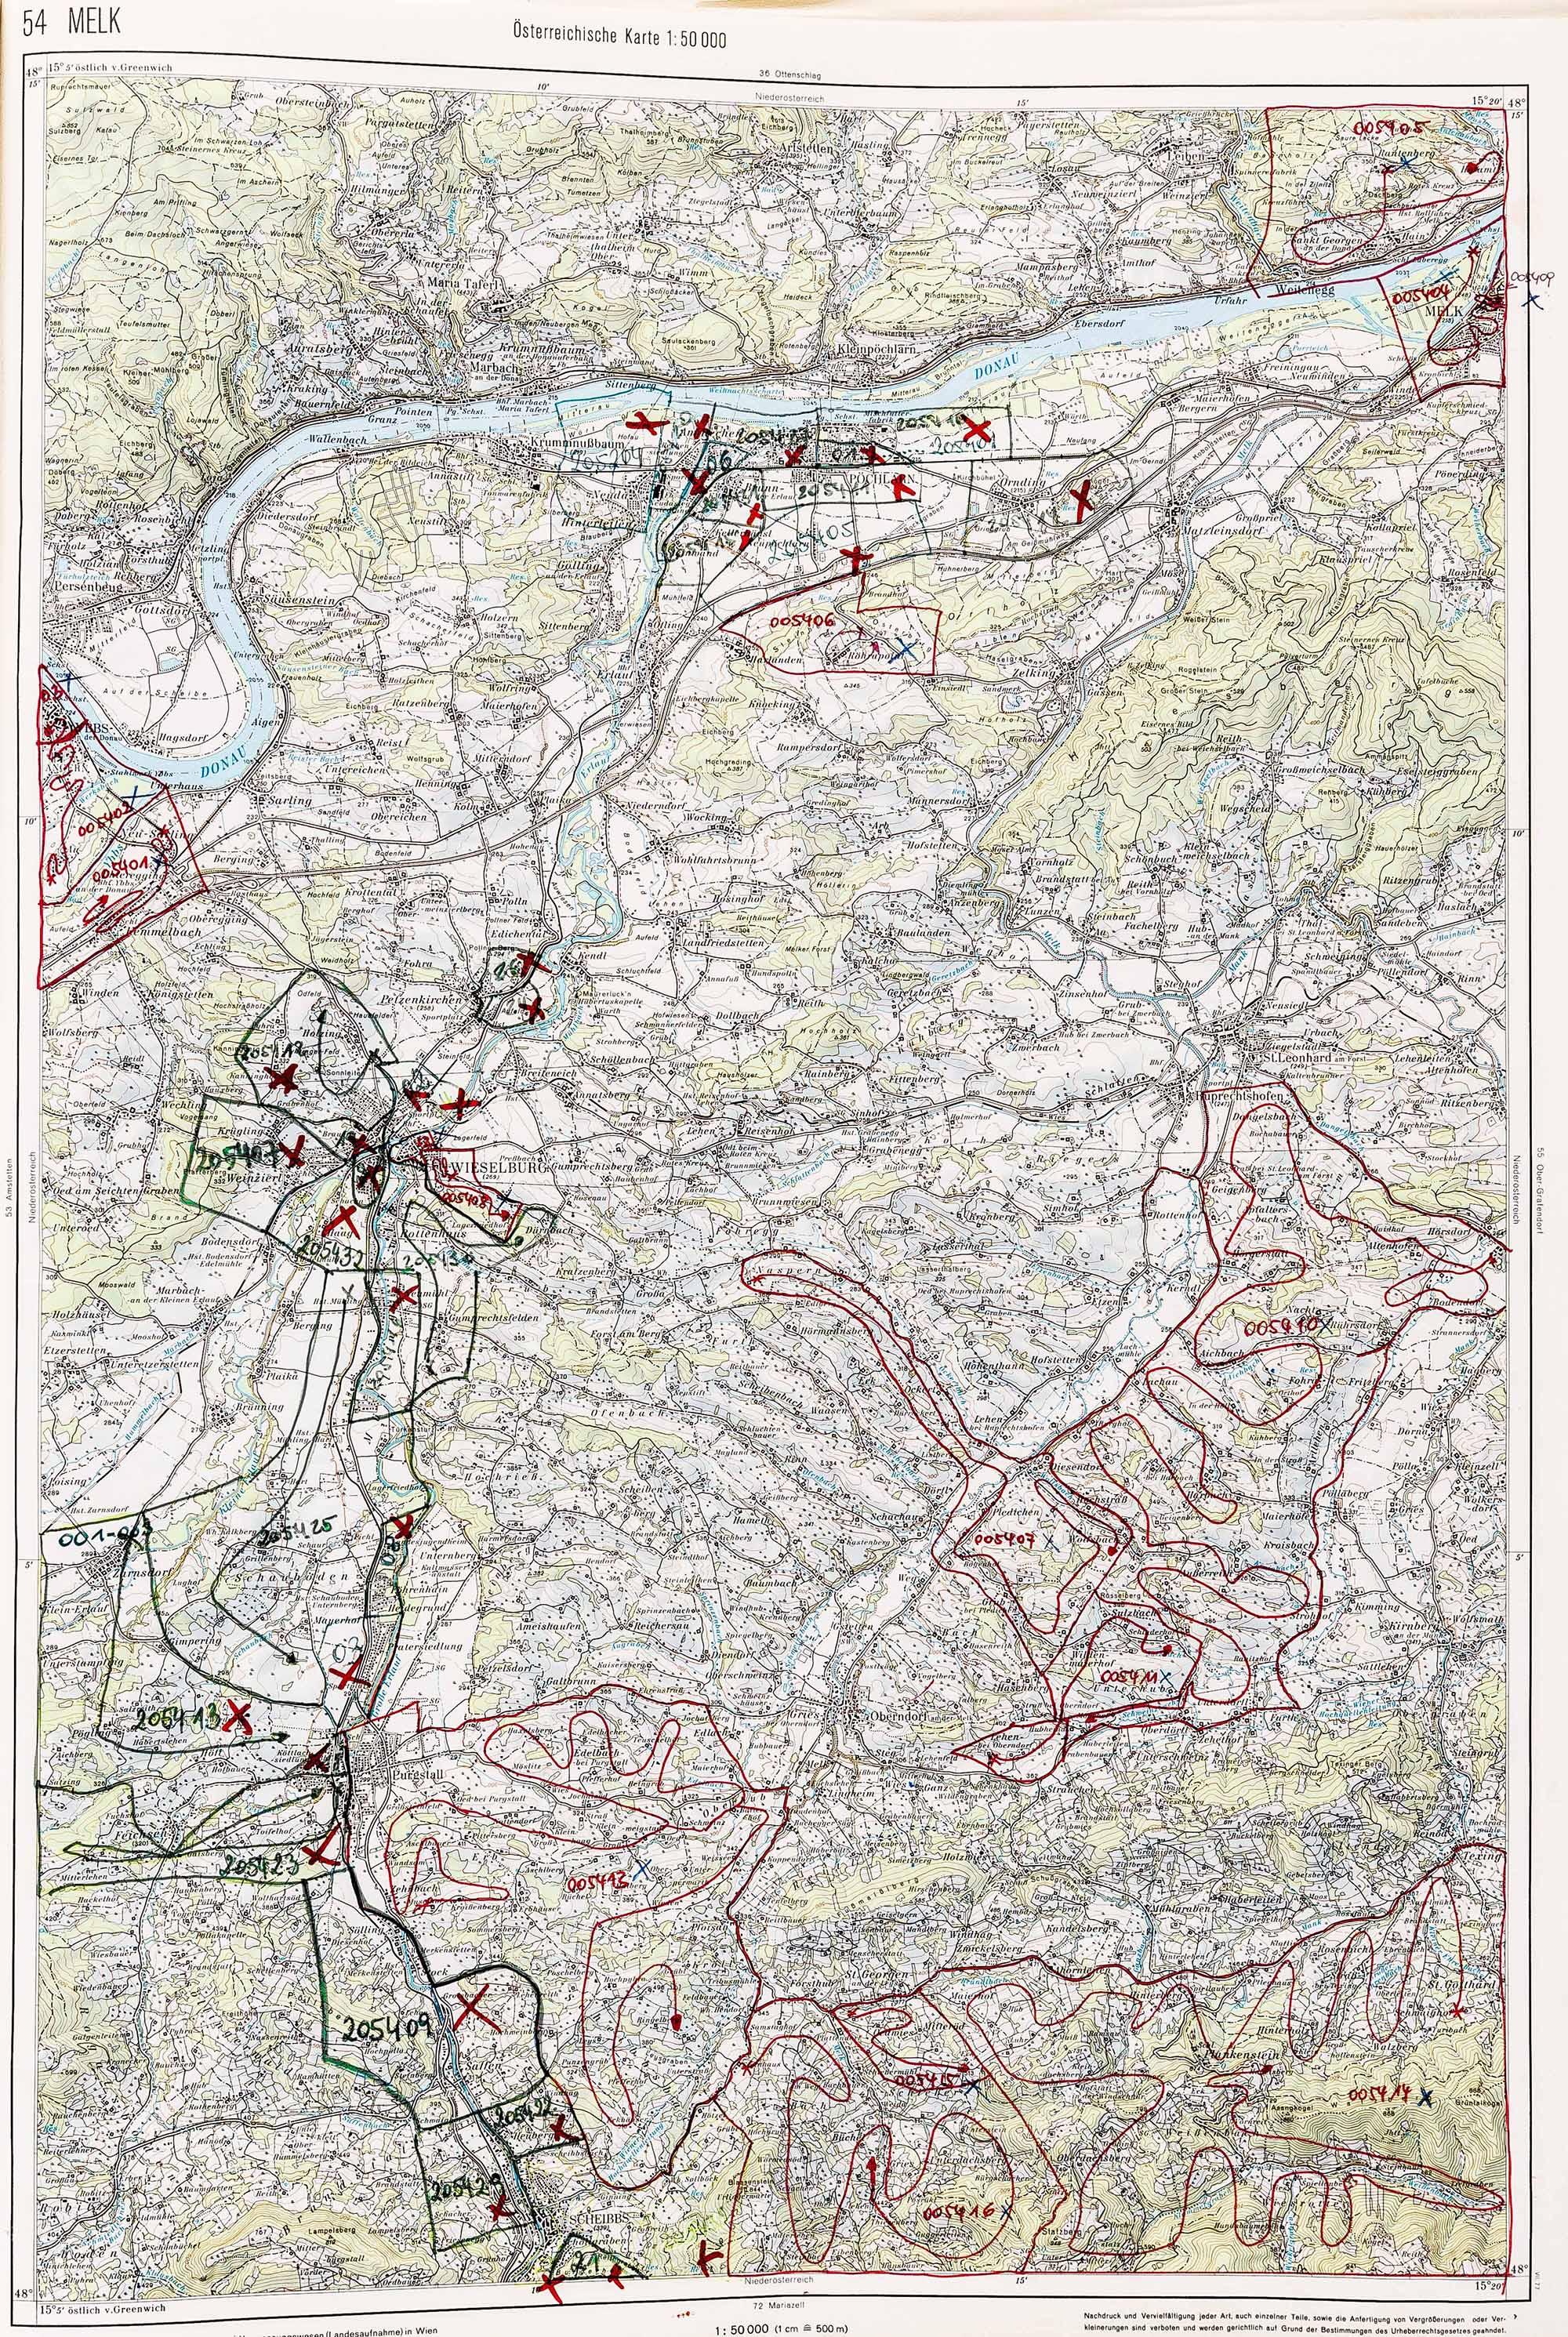 1979-1982 Karte 054